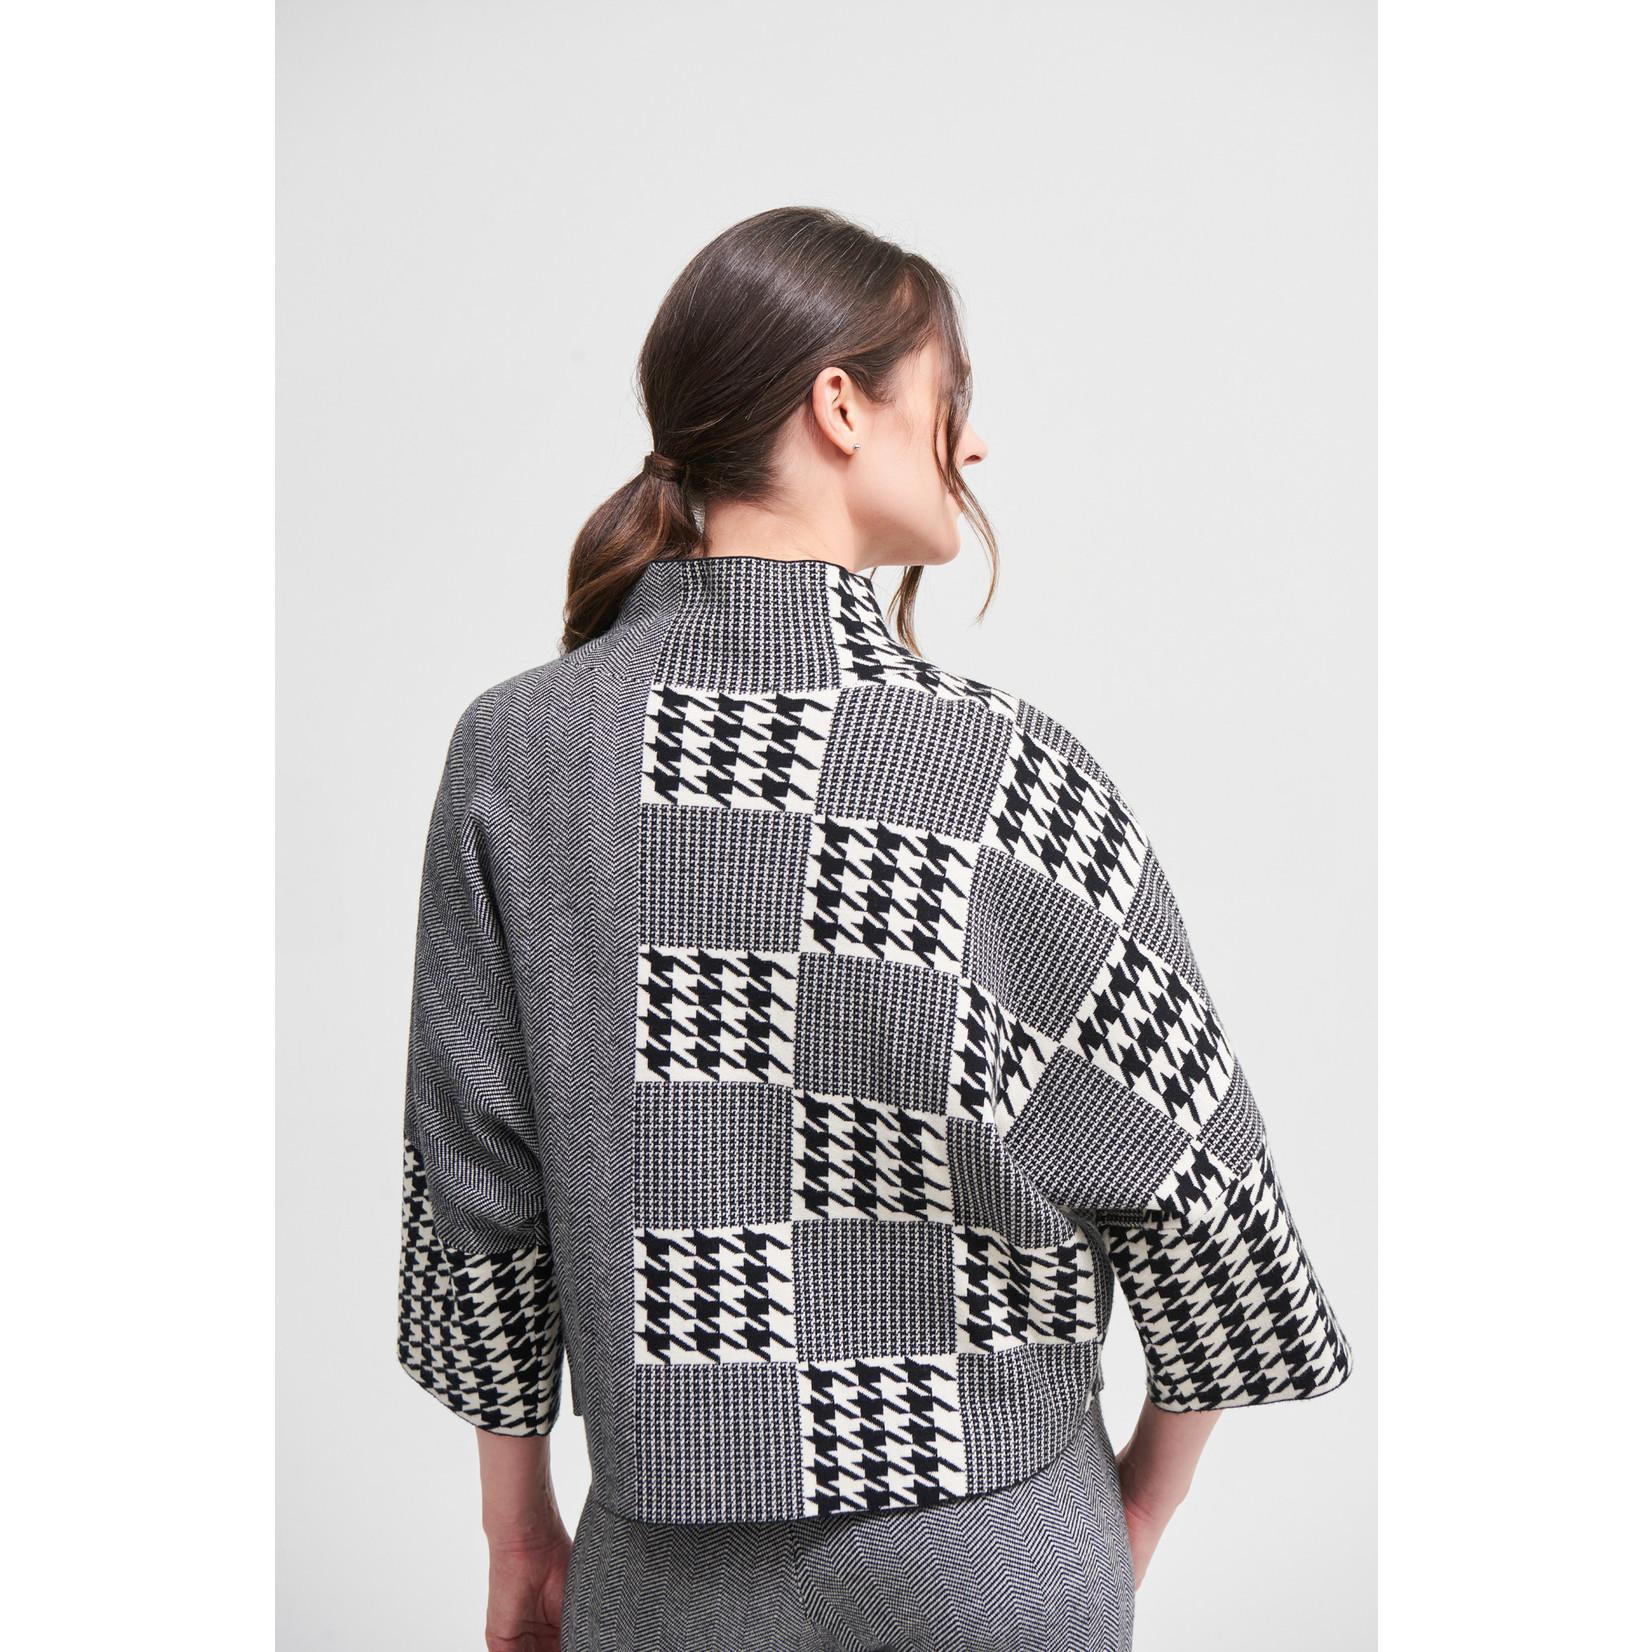 Joseph Ribkoff Black/Vanilla Houndstooth Sweater Style 213912